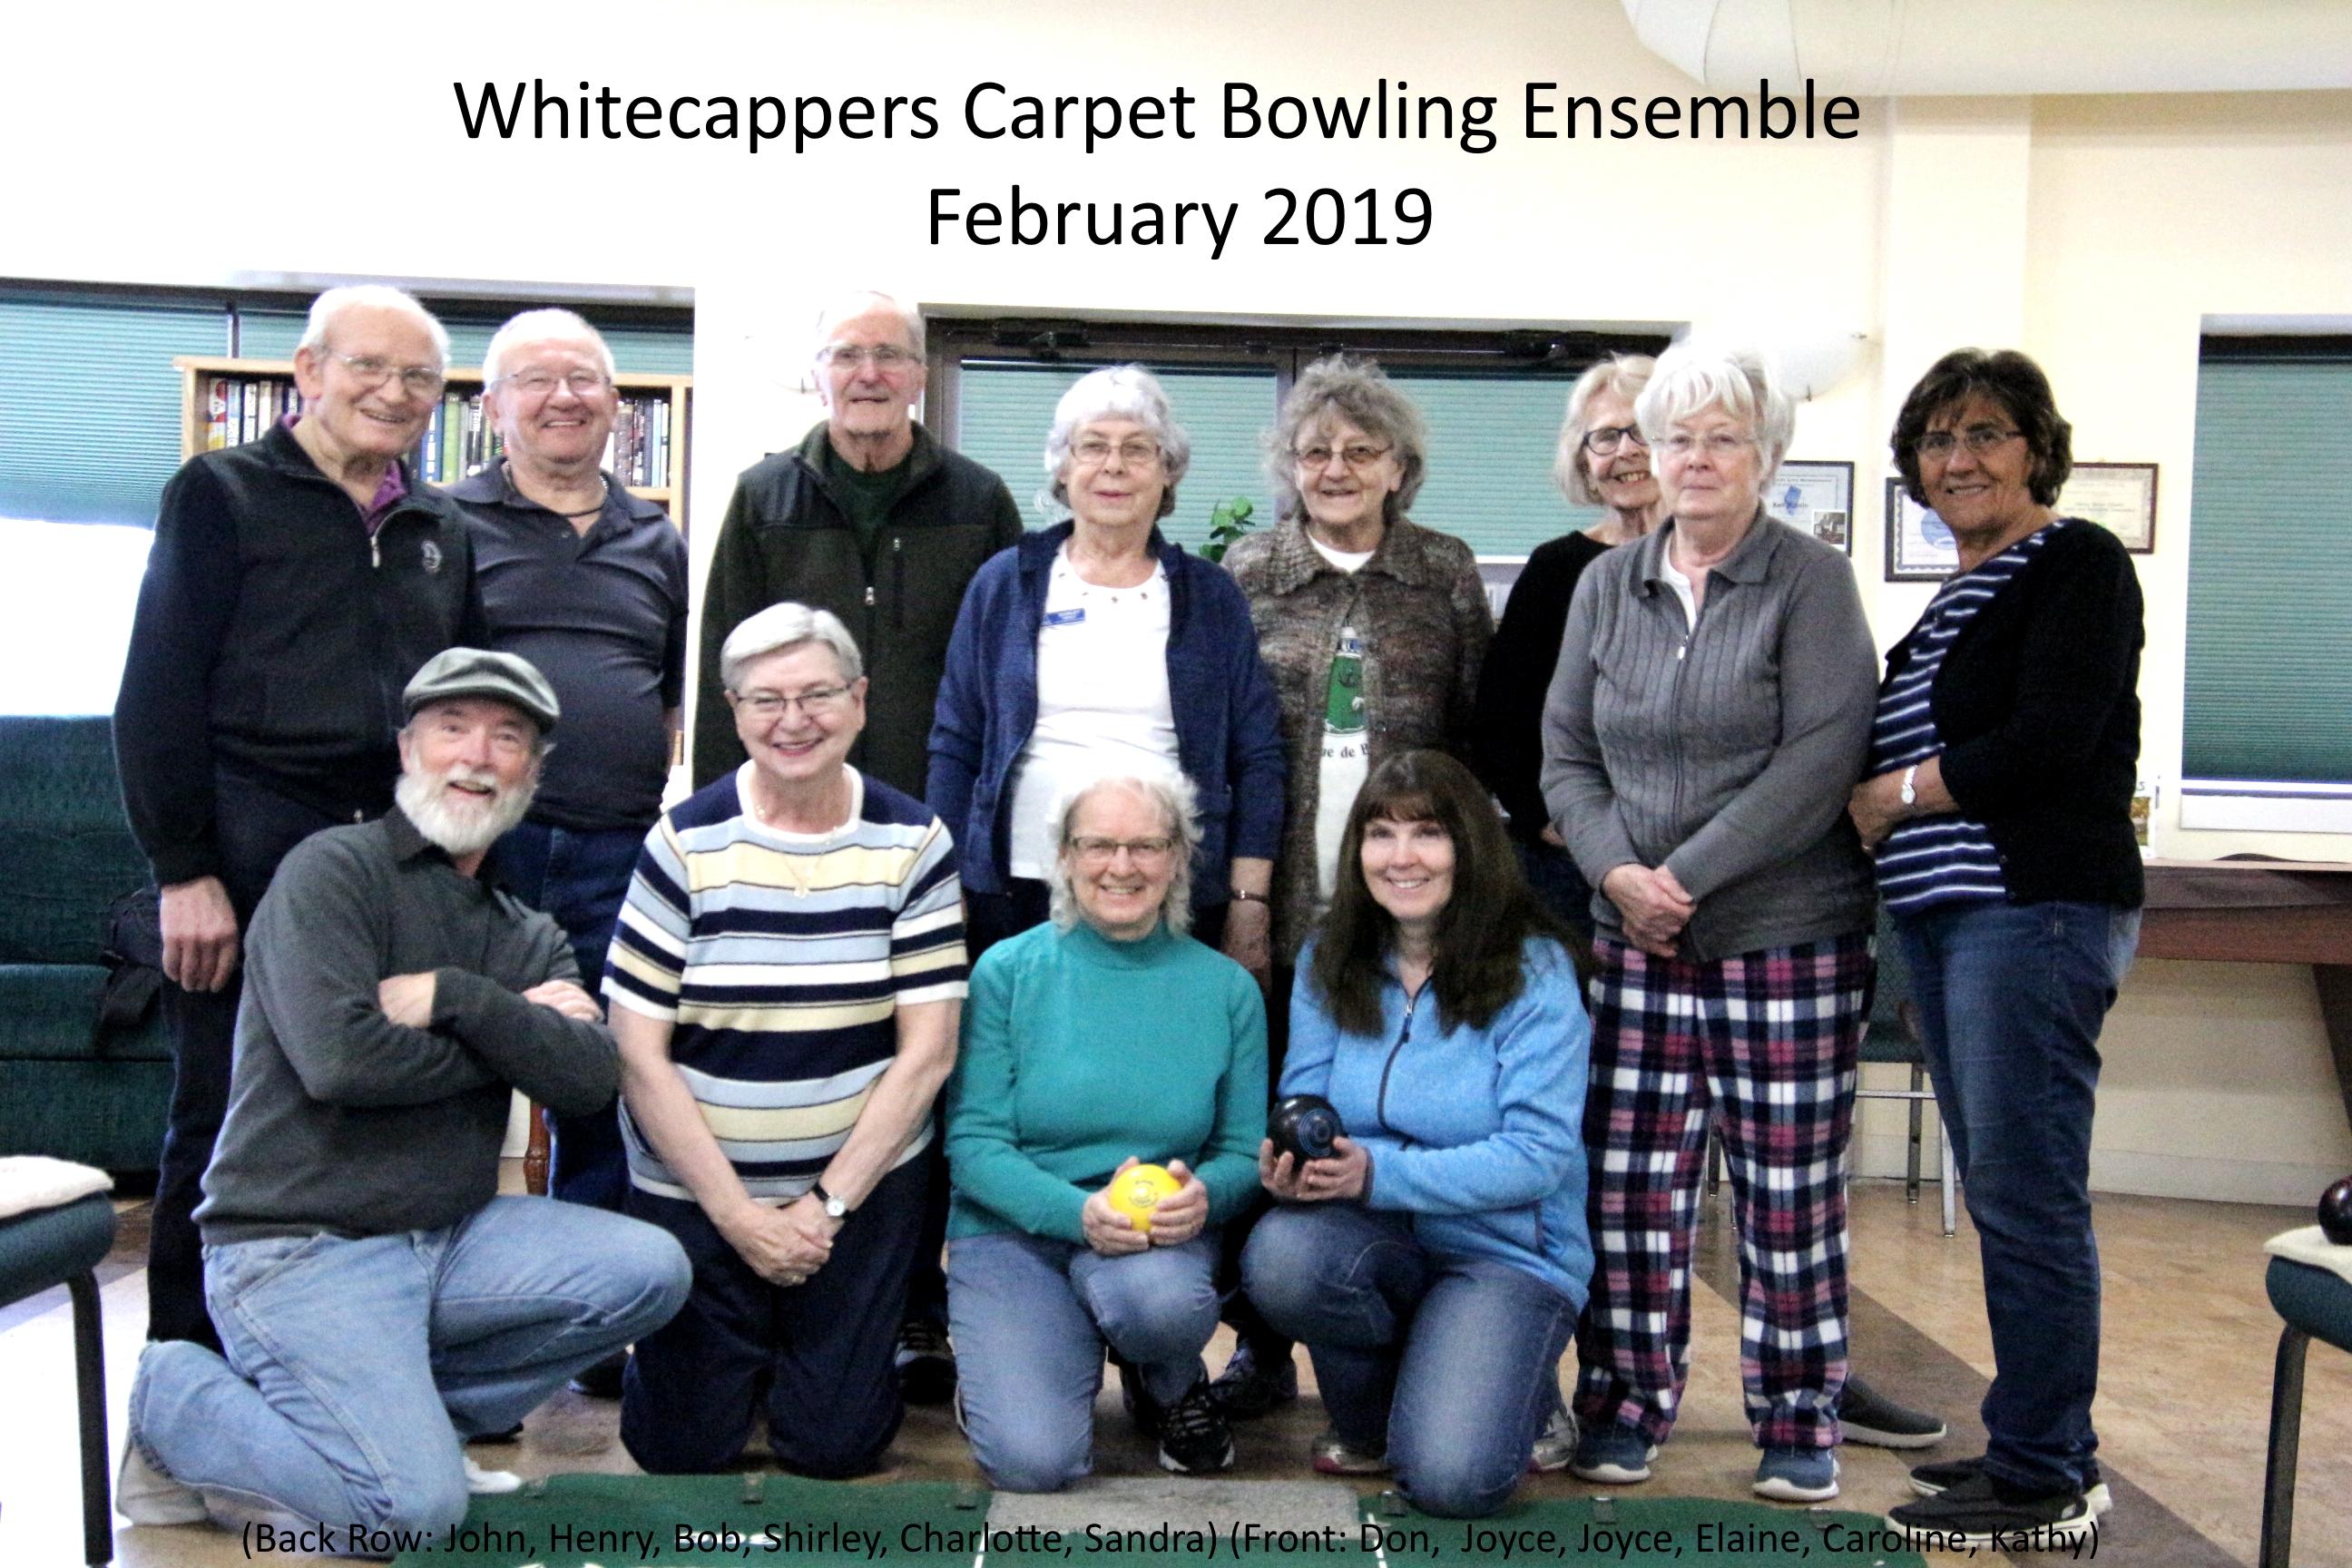 https://0901.nccdn.net/4_2/000/000/07a/dbb/Carpet-Bowlers-Group-Picture.jpg